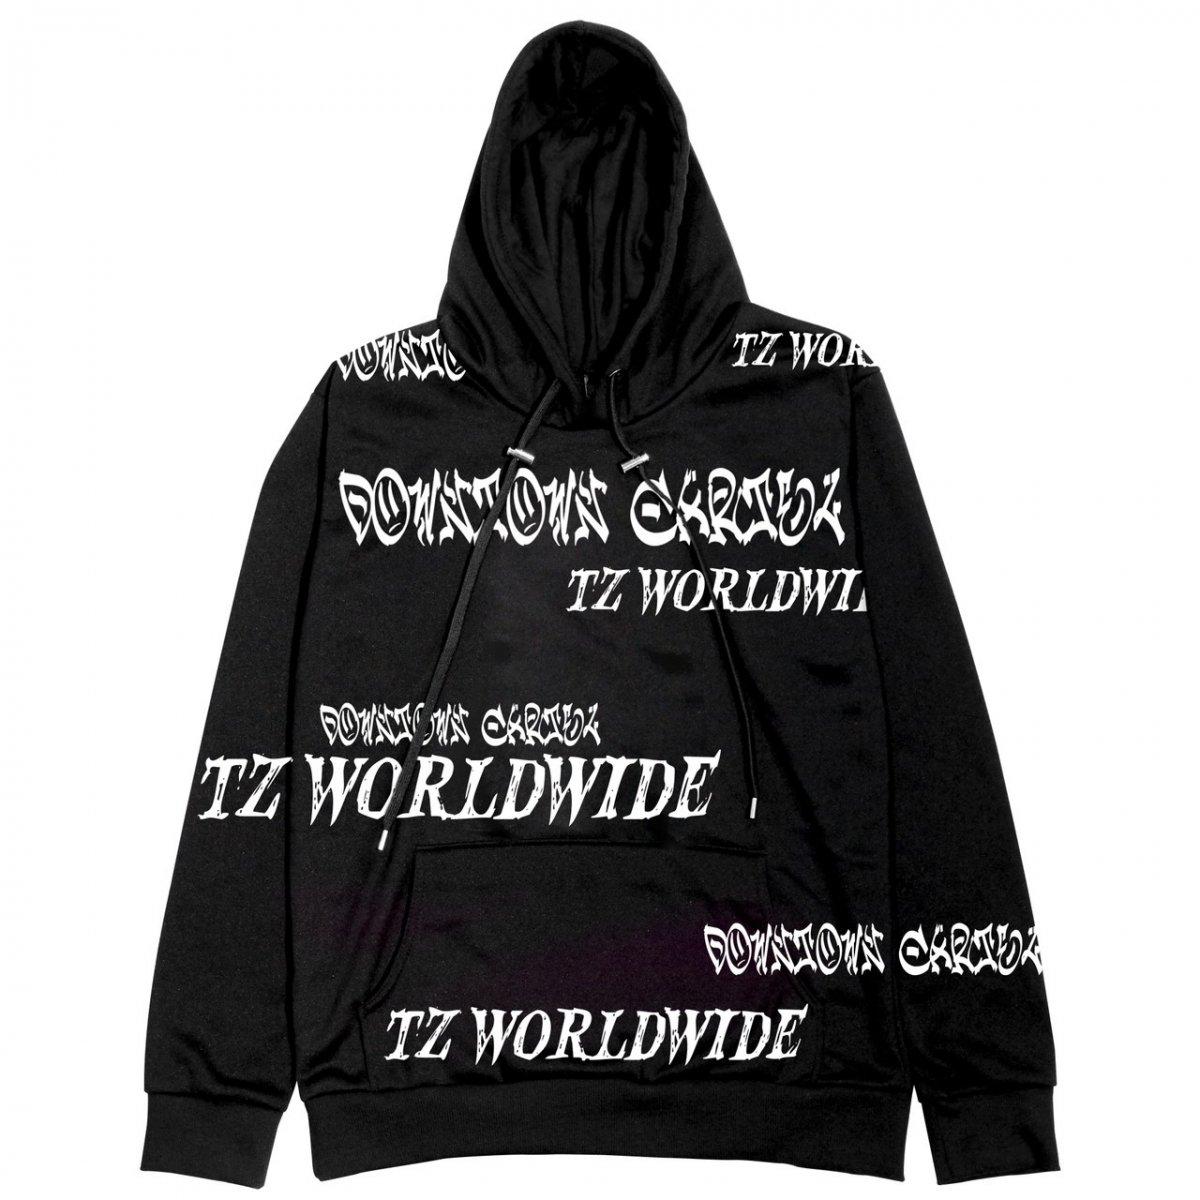 DOWNTOWN CARTEL×TZ Worldwide Collaboration Hoodie